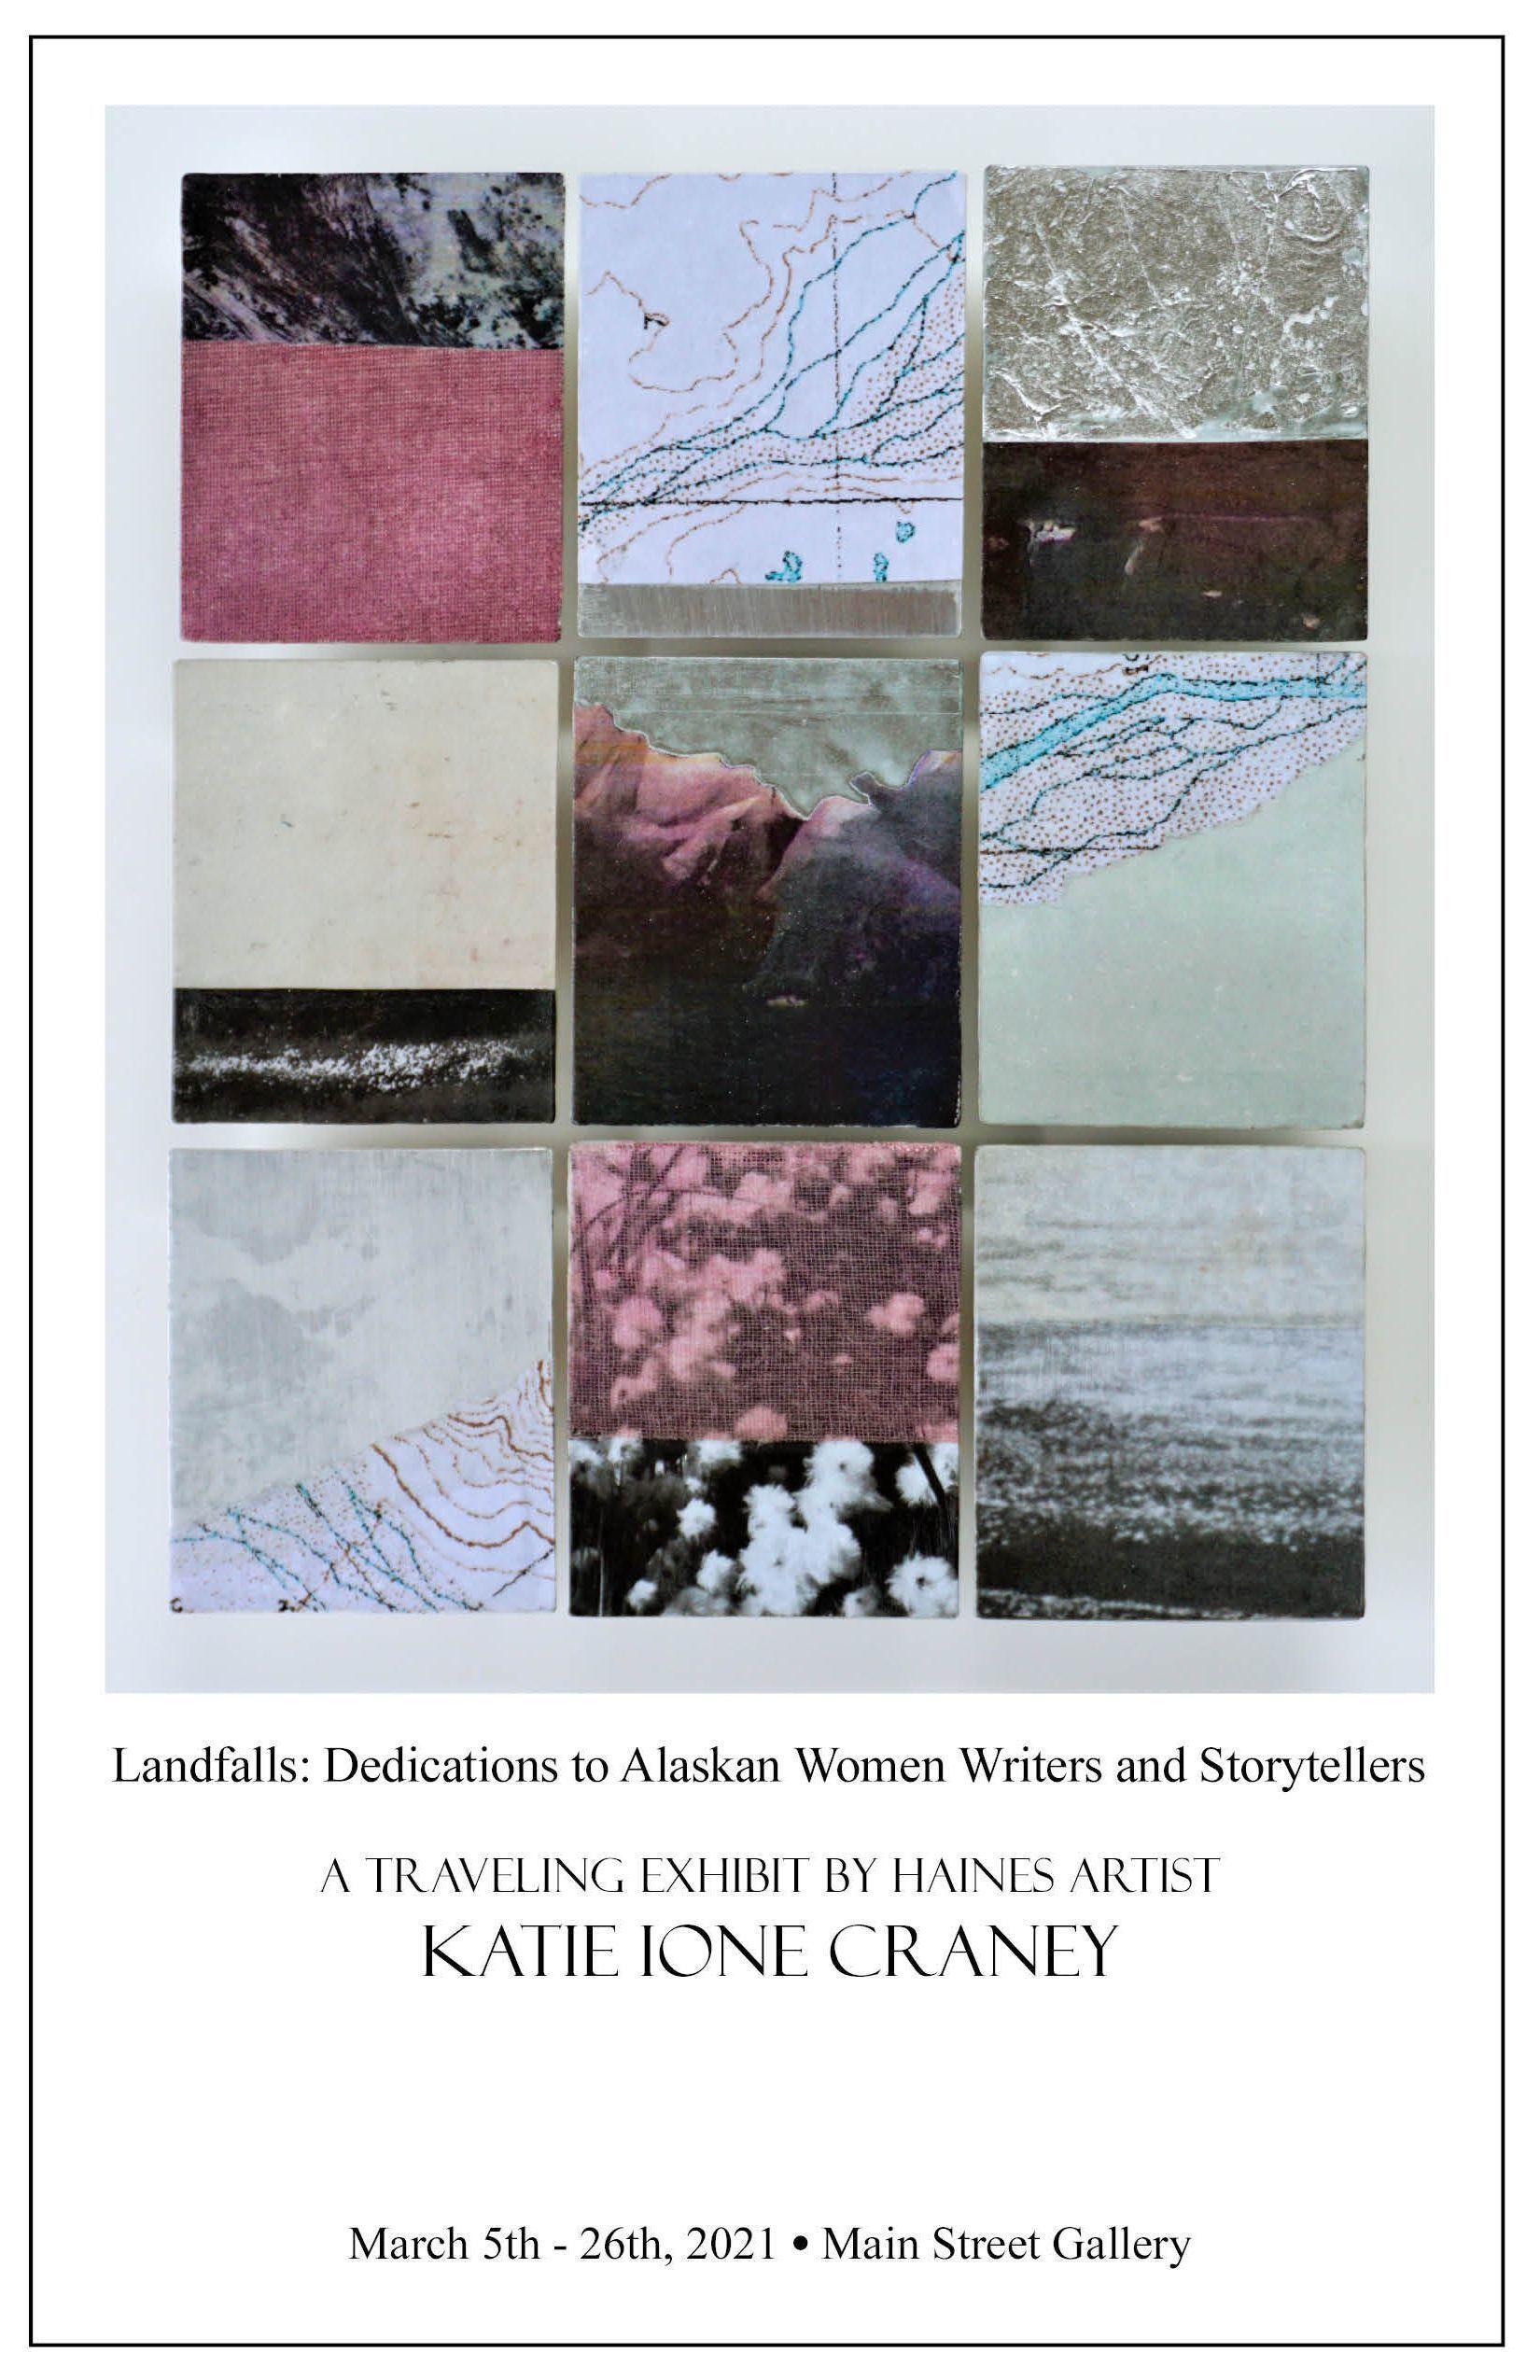 Landfalls: Dedications to Alaskan Women Writers and Storytellers